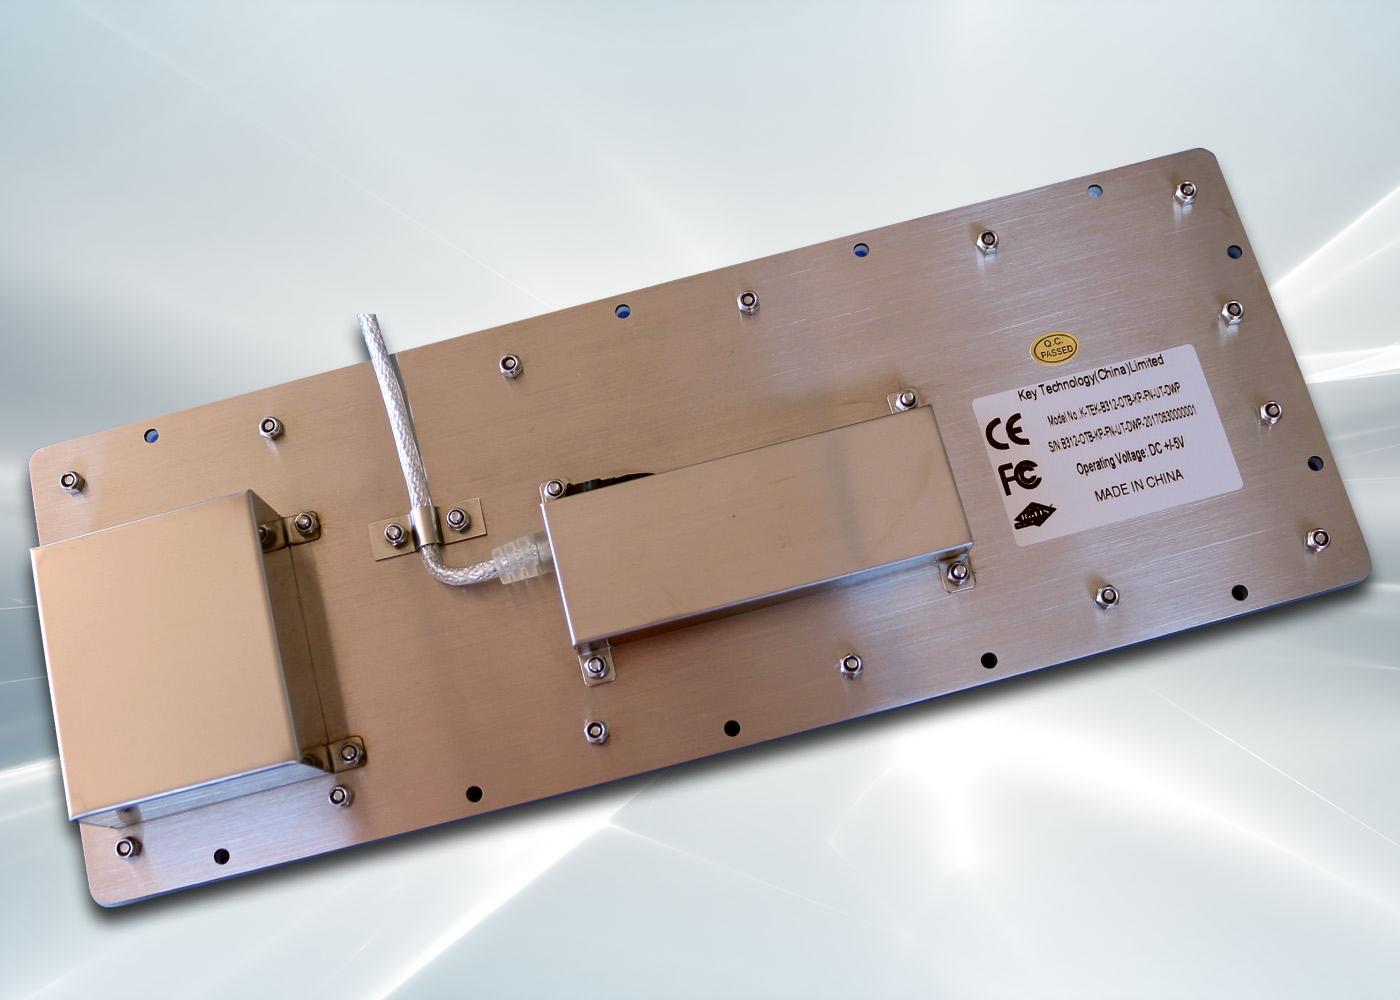 Clavier inox 104 touches avec trackball 25mm – vue arrière